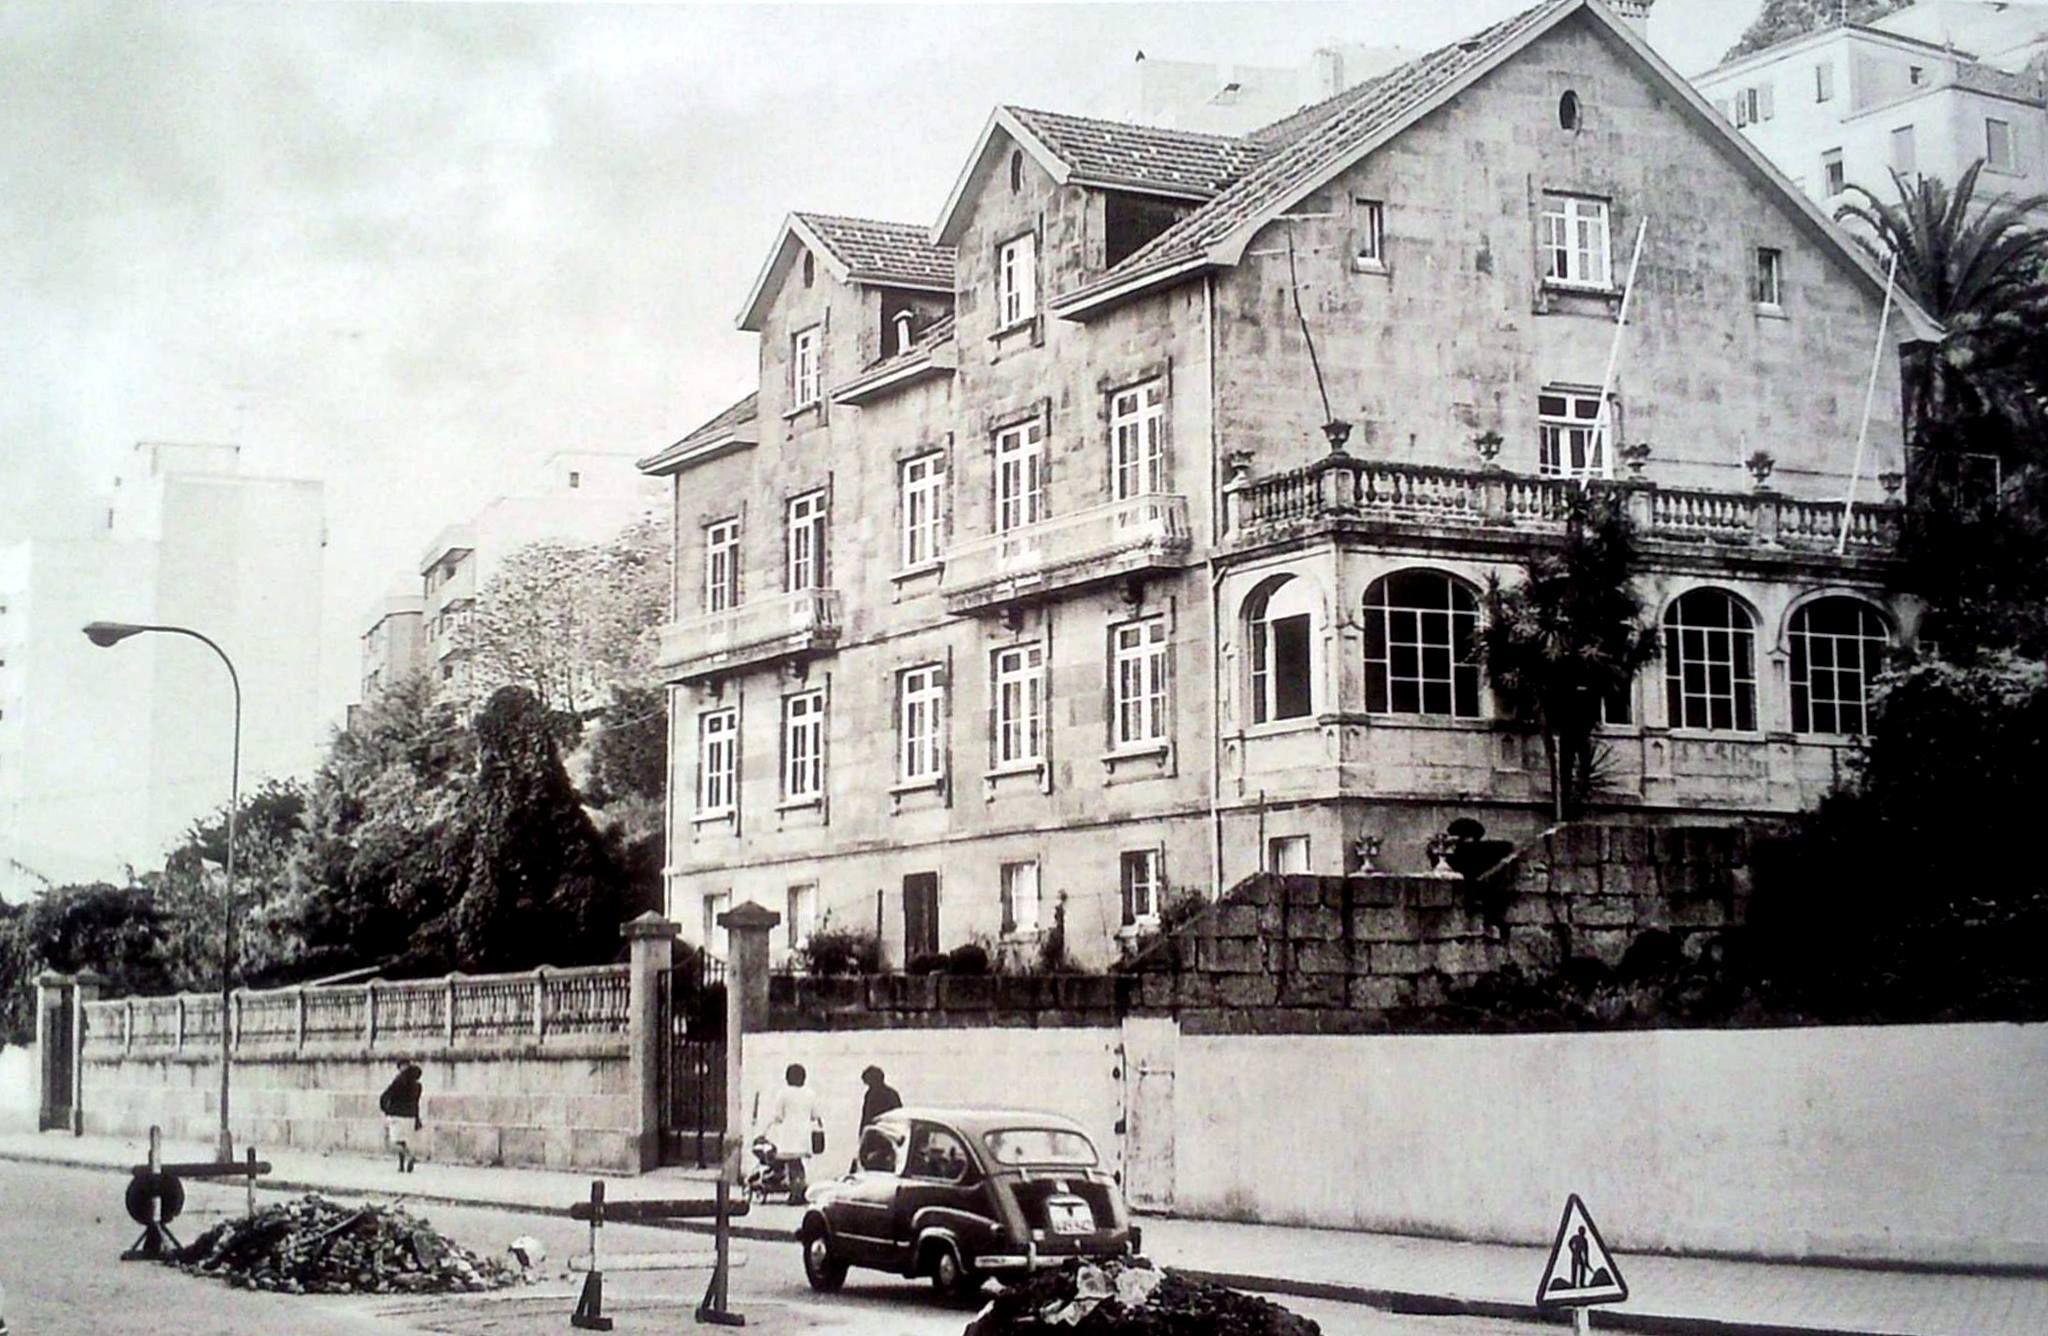 Colexio alem n na r a de torrecedeira vigo en branco e negro pinterest - Hotel puerta del sol vigo ...